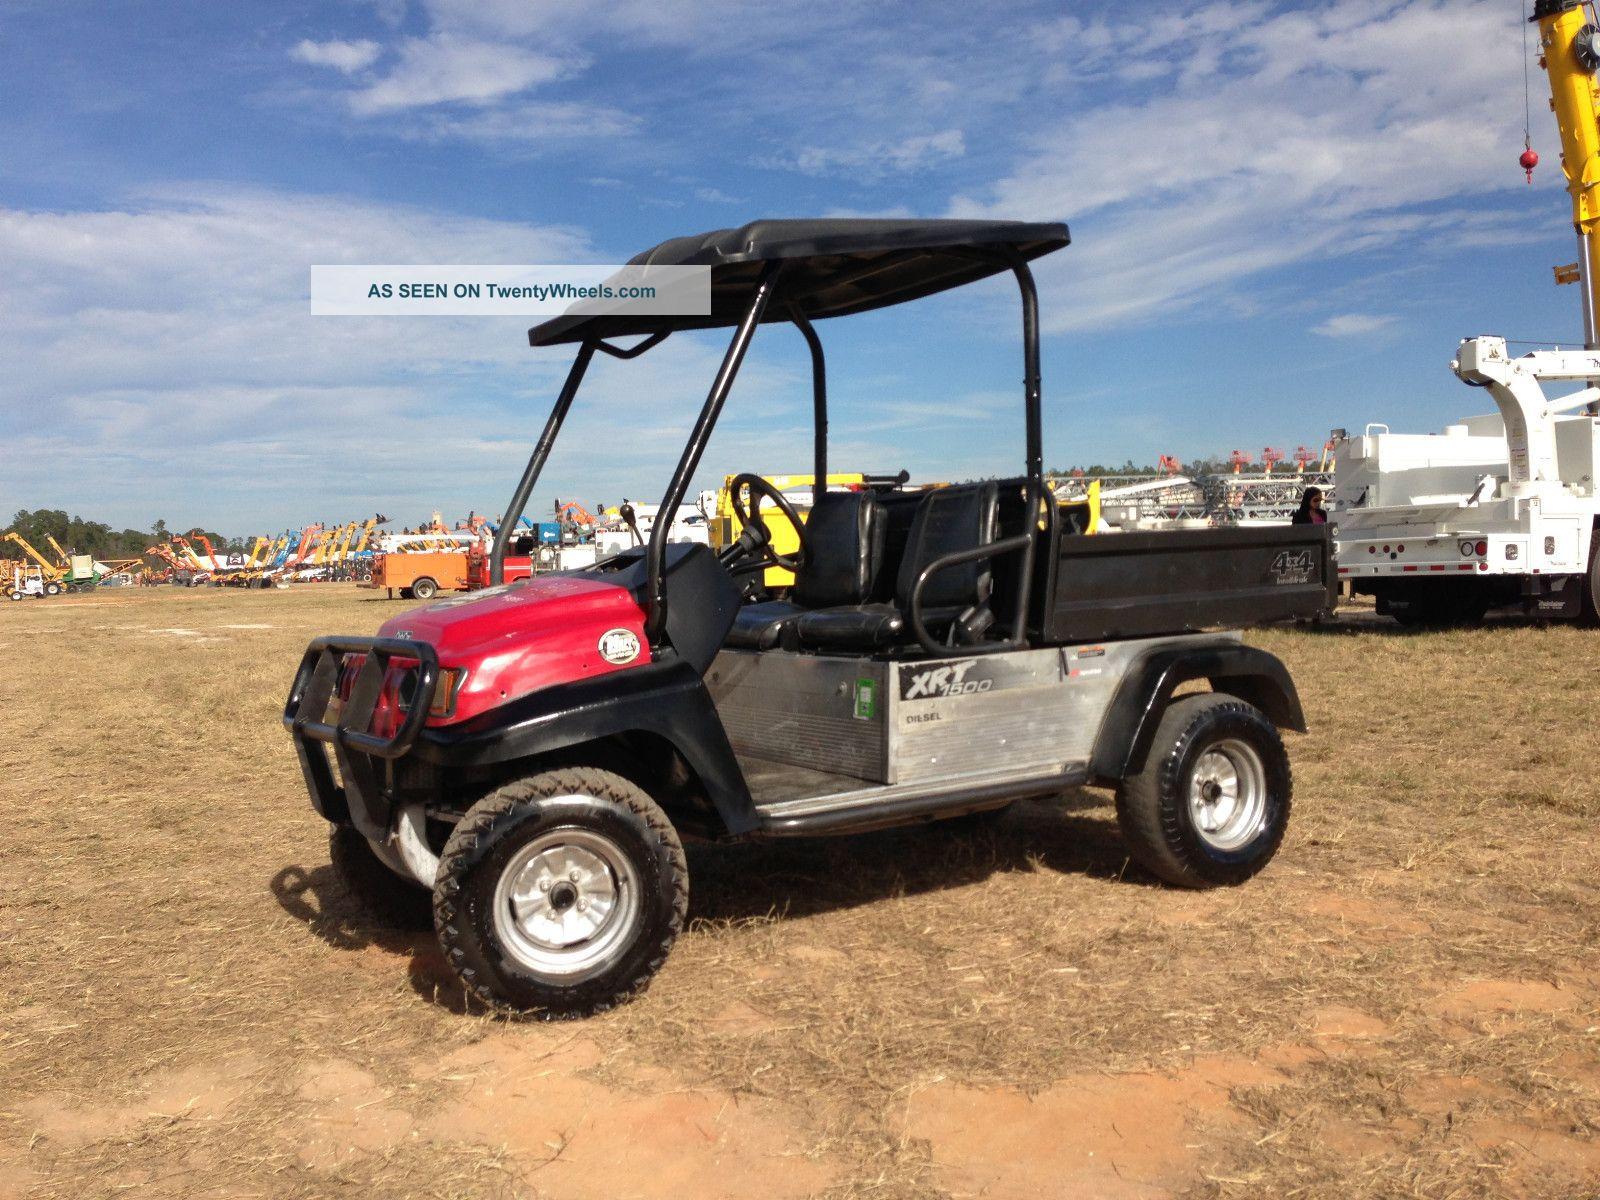 Ingersol Rand Utility Truck Diesel Kubota Utv Atv Dump Bed Sunshade Club Car Lgw